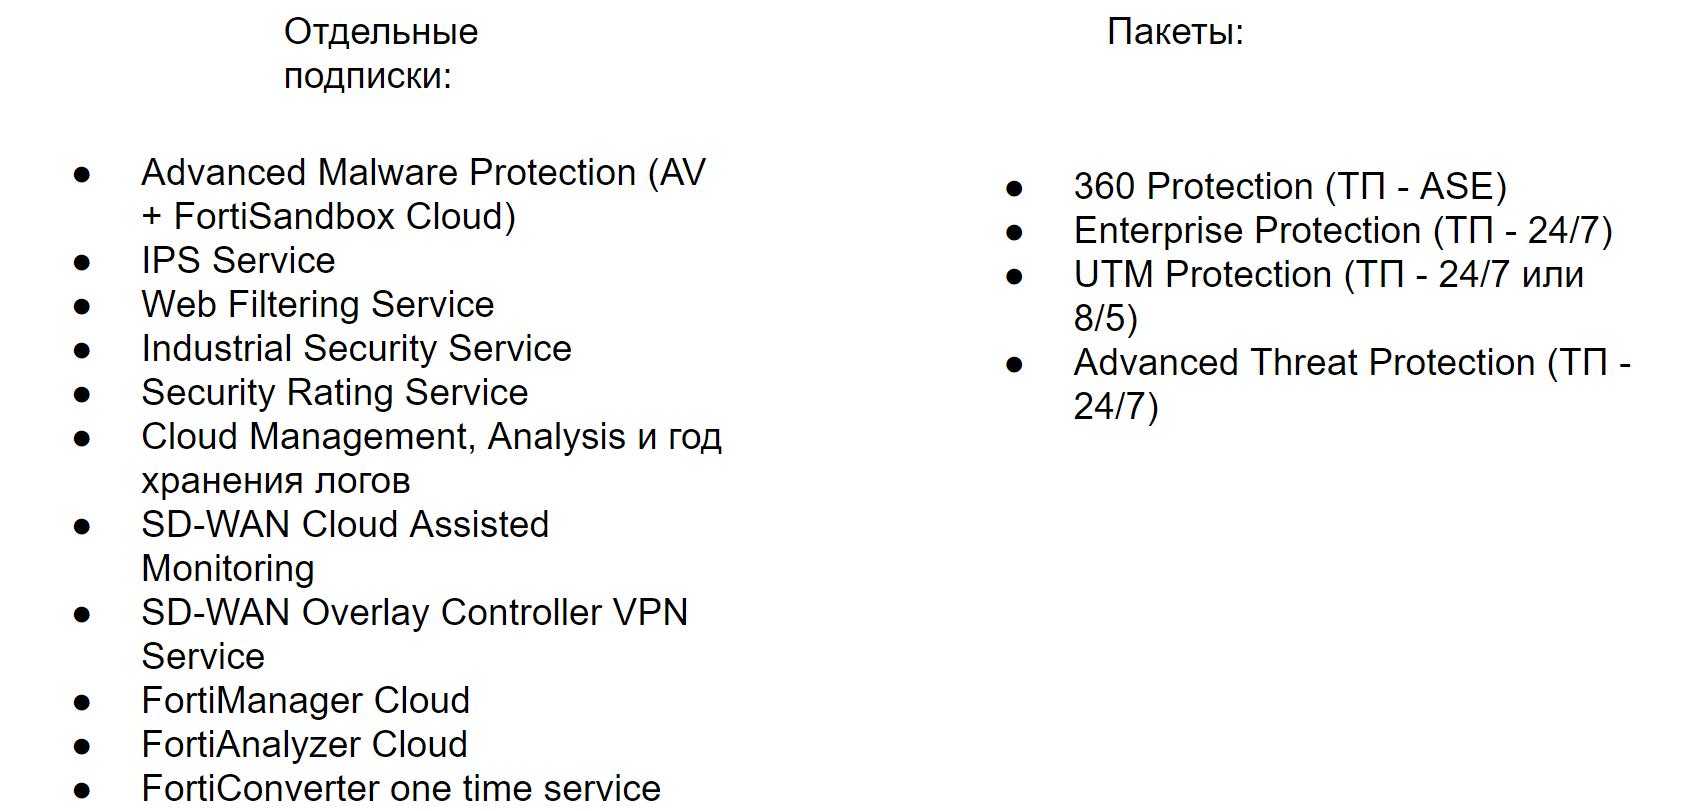 11. Fortinet Getting Started v6.0. Лицензирование